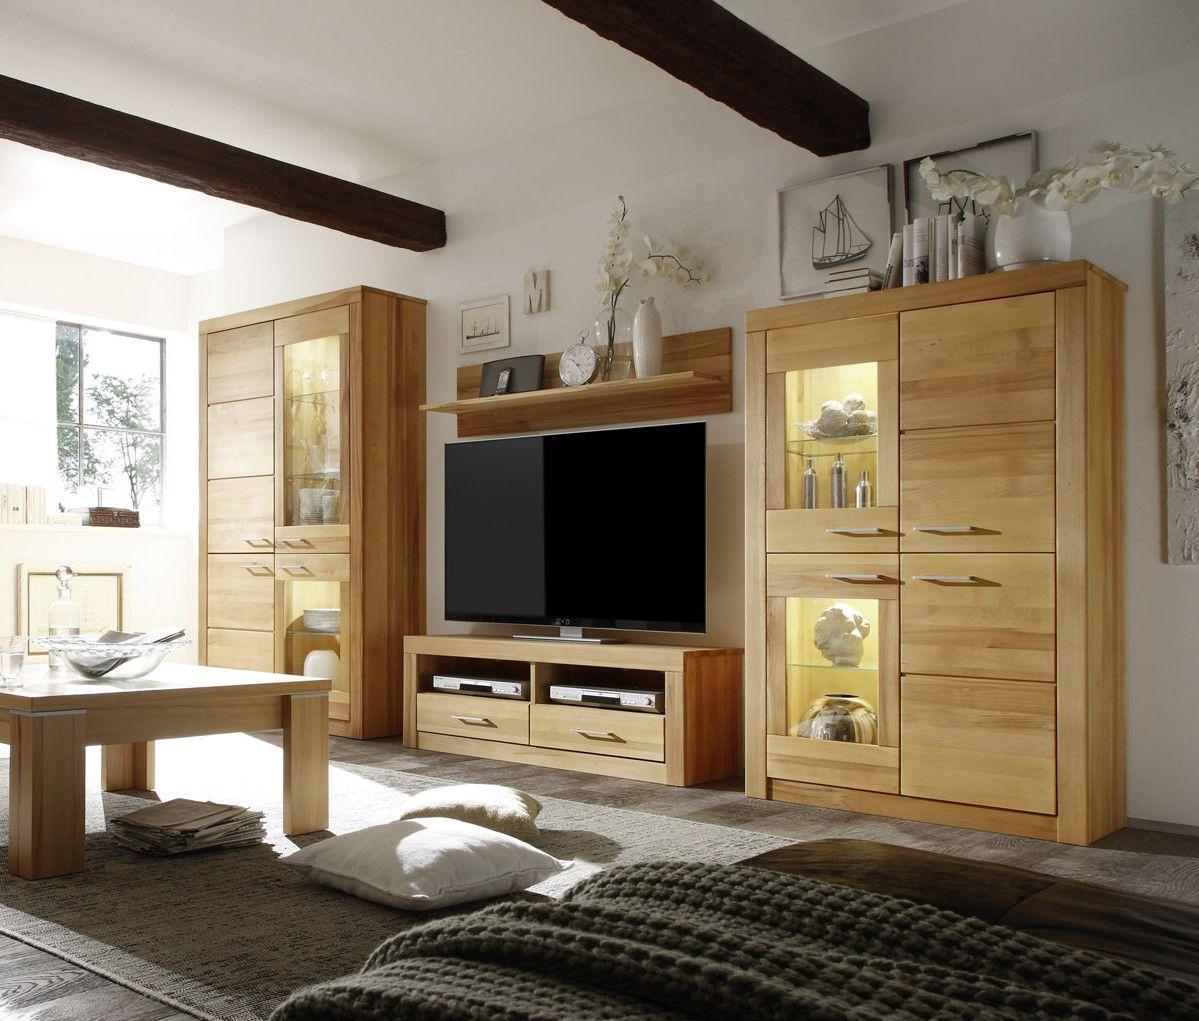 Billig Wohnwände Holz Massiv Modern